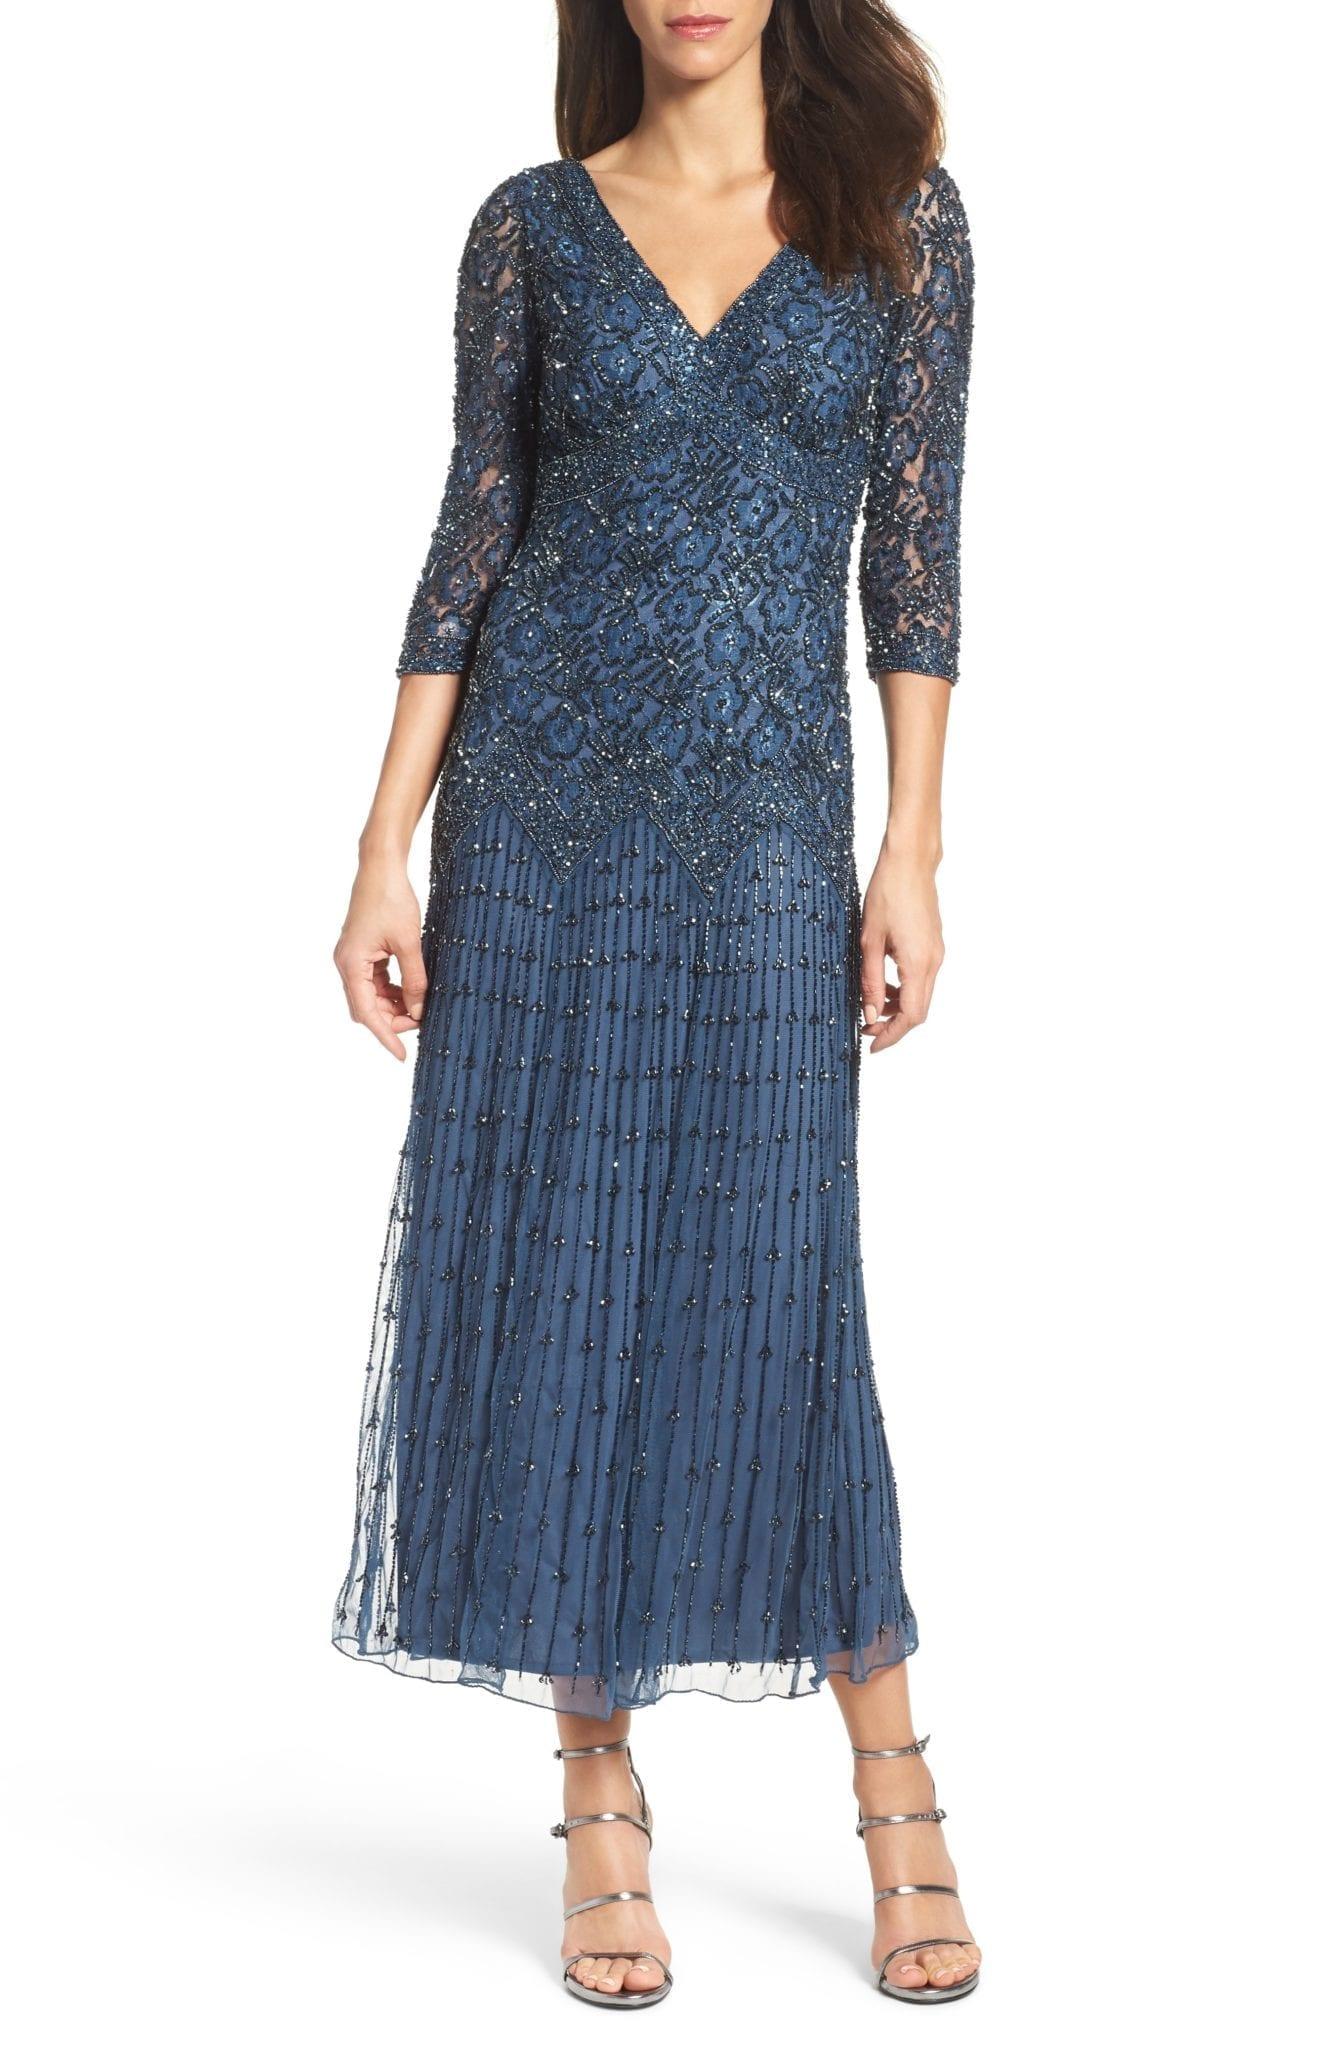 8a029dafe83 PISARRO NIGHTS Beaded Mesh Blue Dress - We Select Dresses